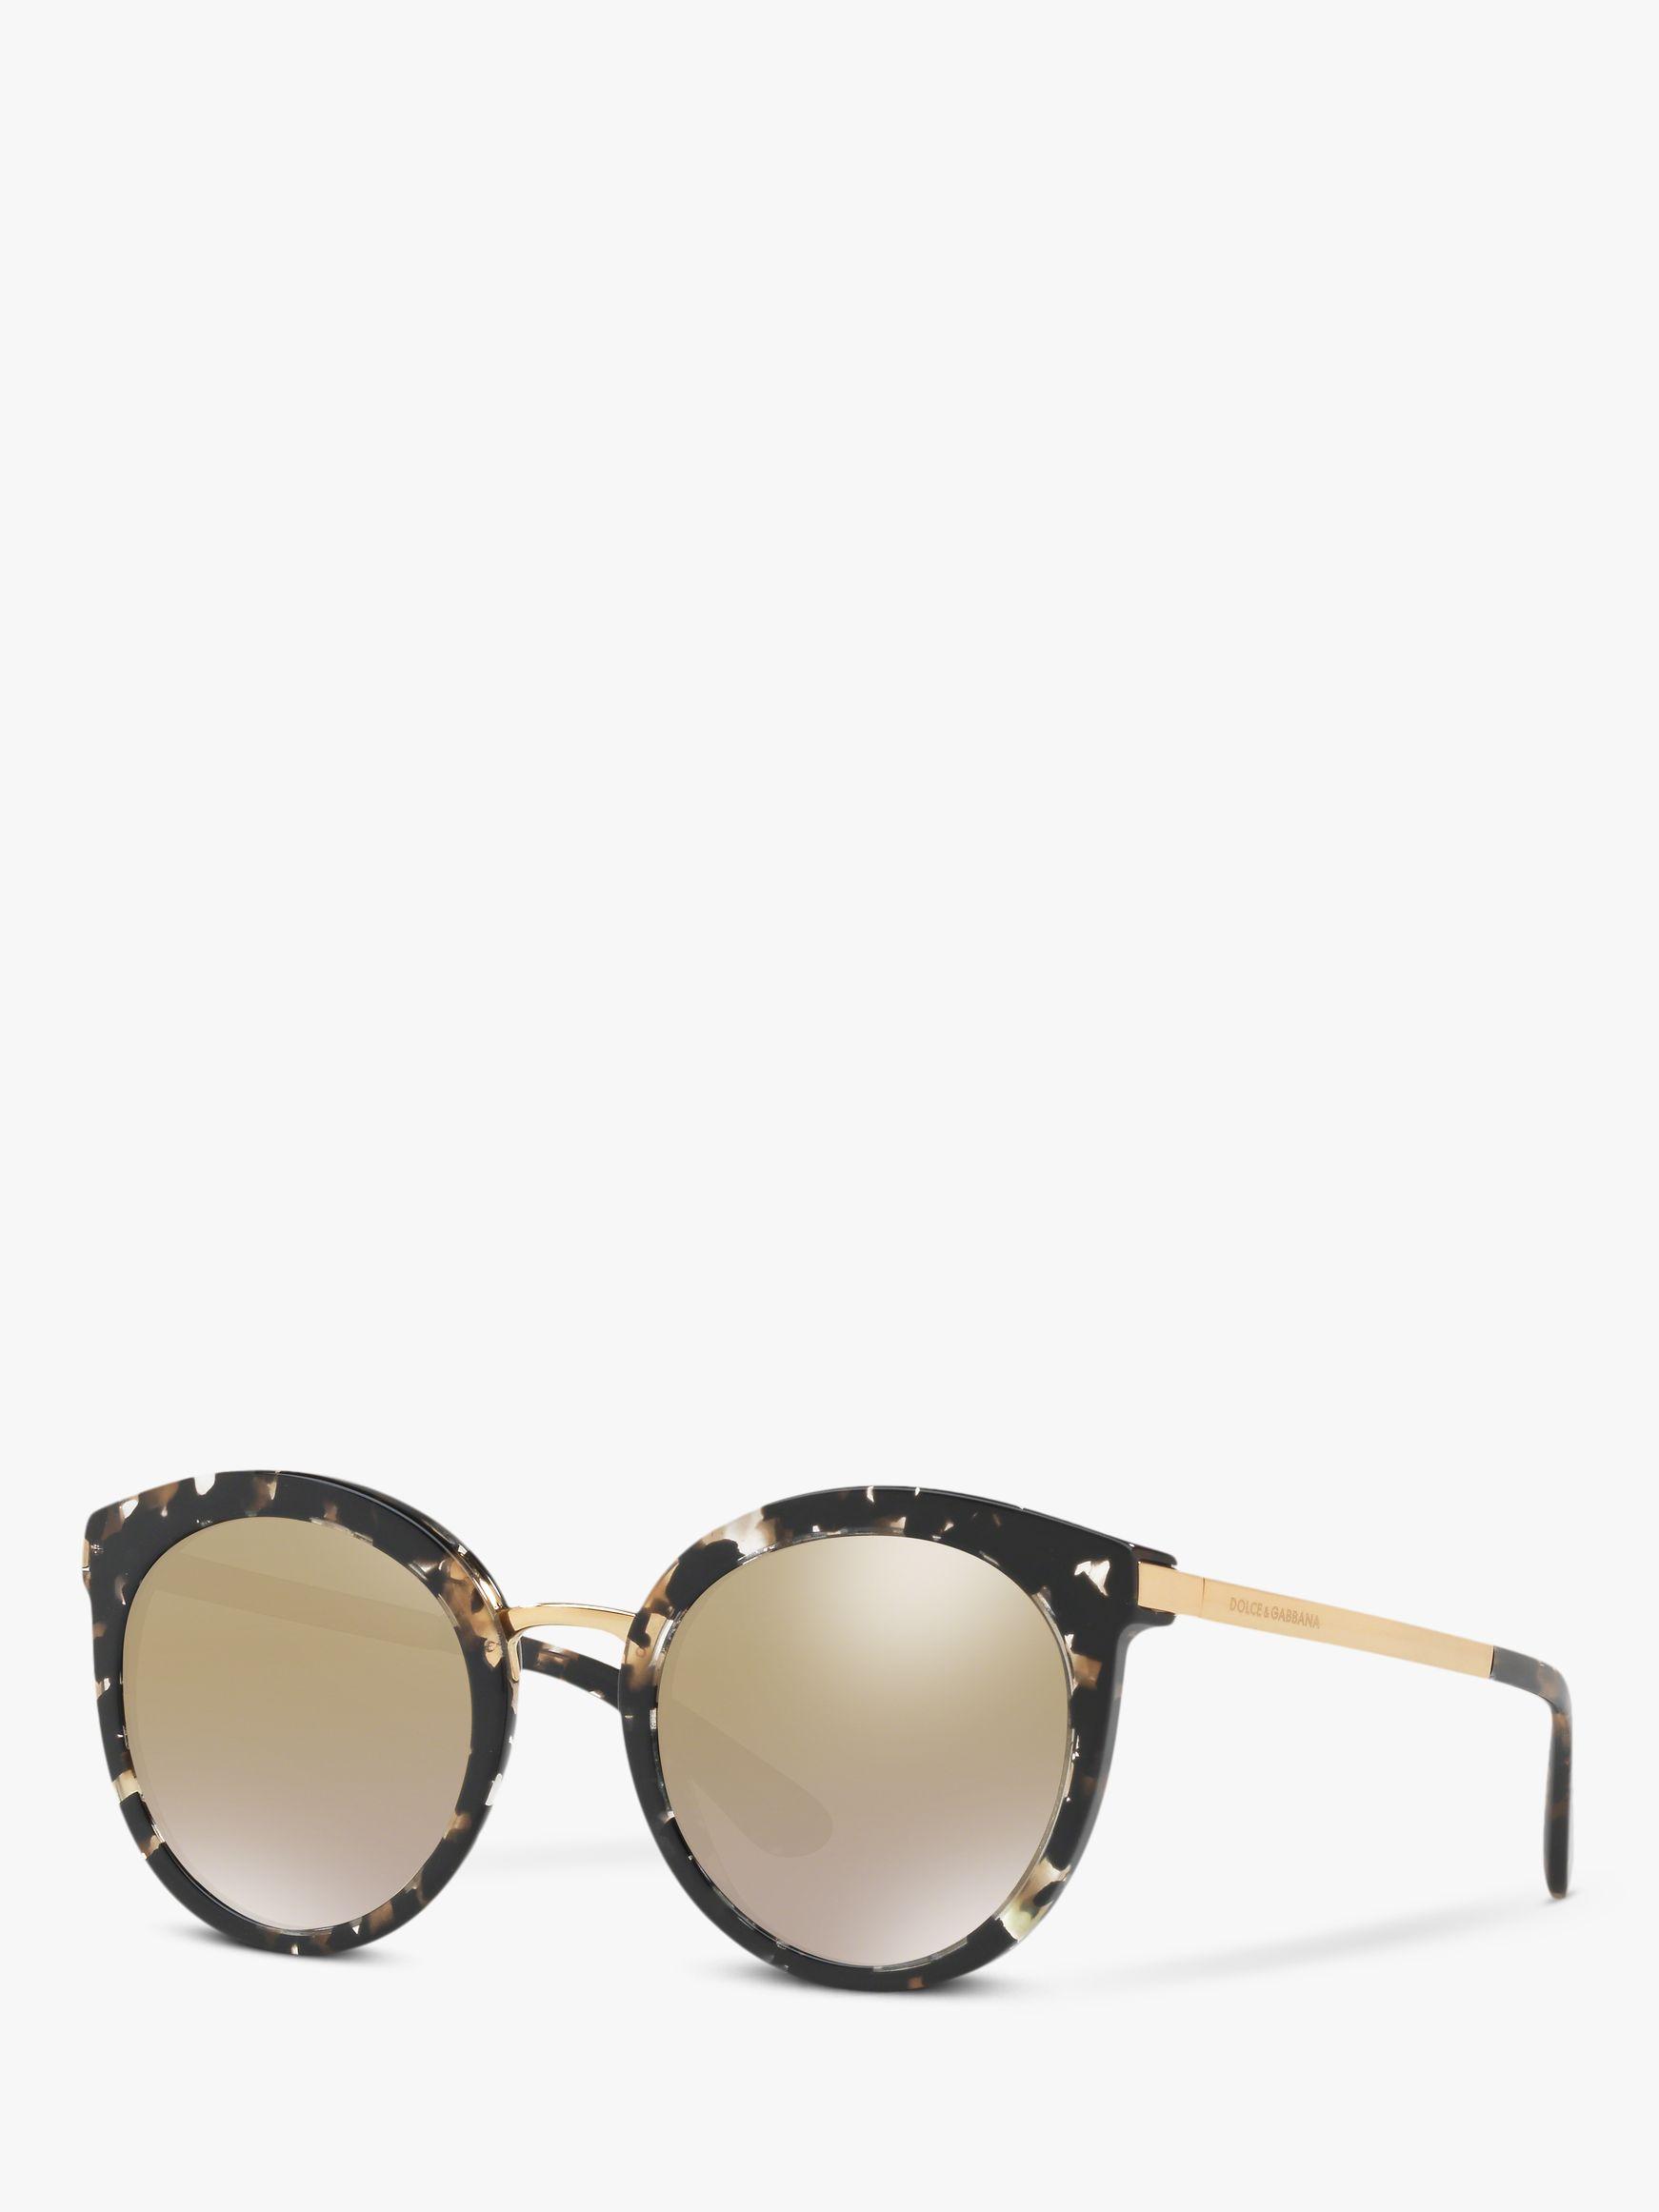 Dolce & Gabbana Dolce & Gabbana DG4268 Women's Round Sunglasses